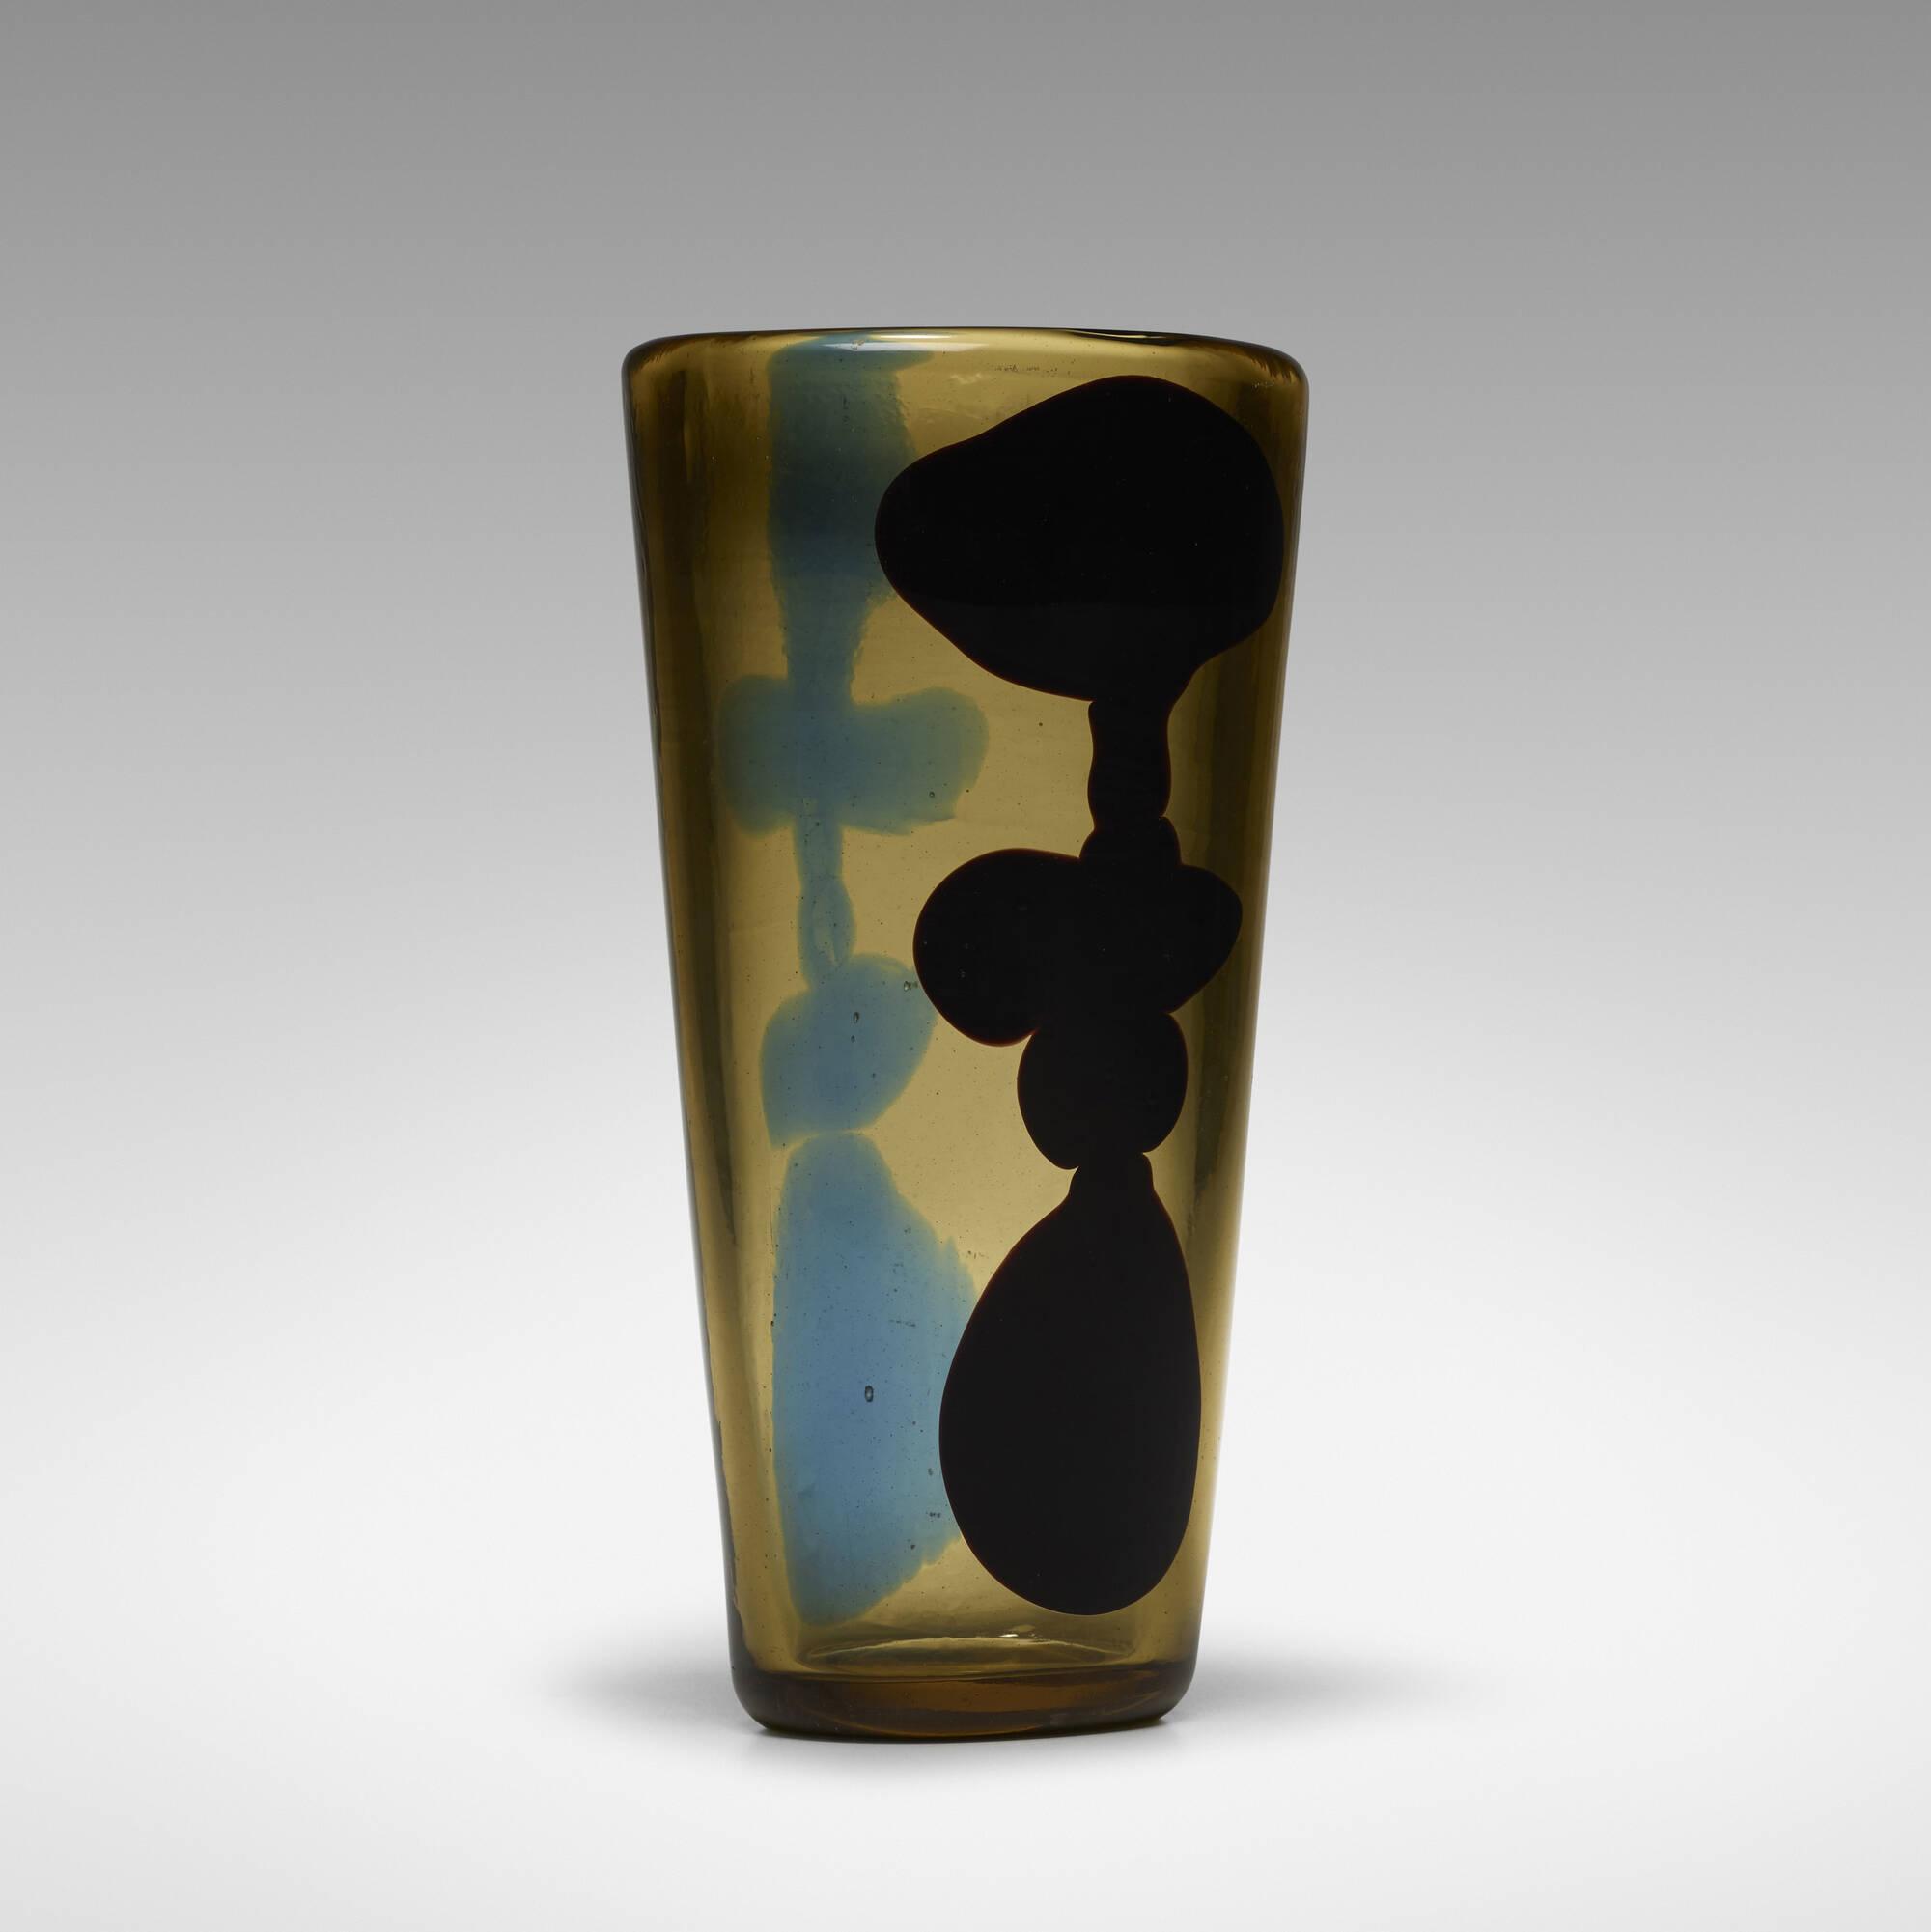 136: Fulvio Bianconi / Con Macchie vase (2 of 4)